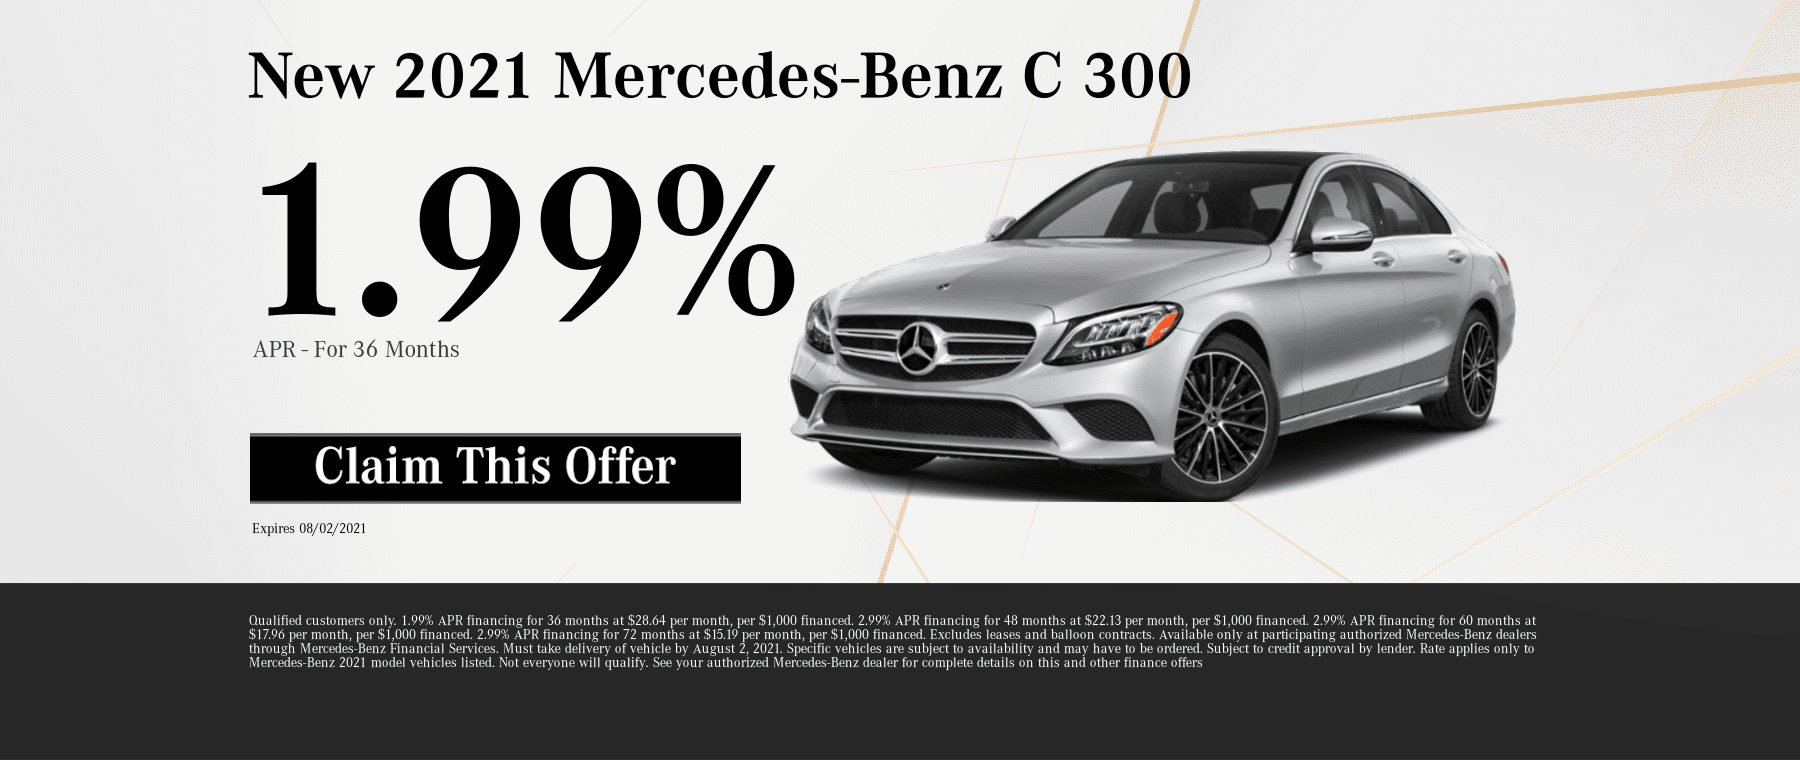 2021-Mercedes-Benz-C 300-Sedan-8